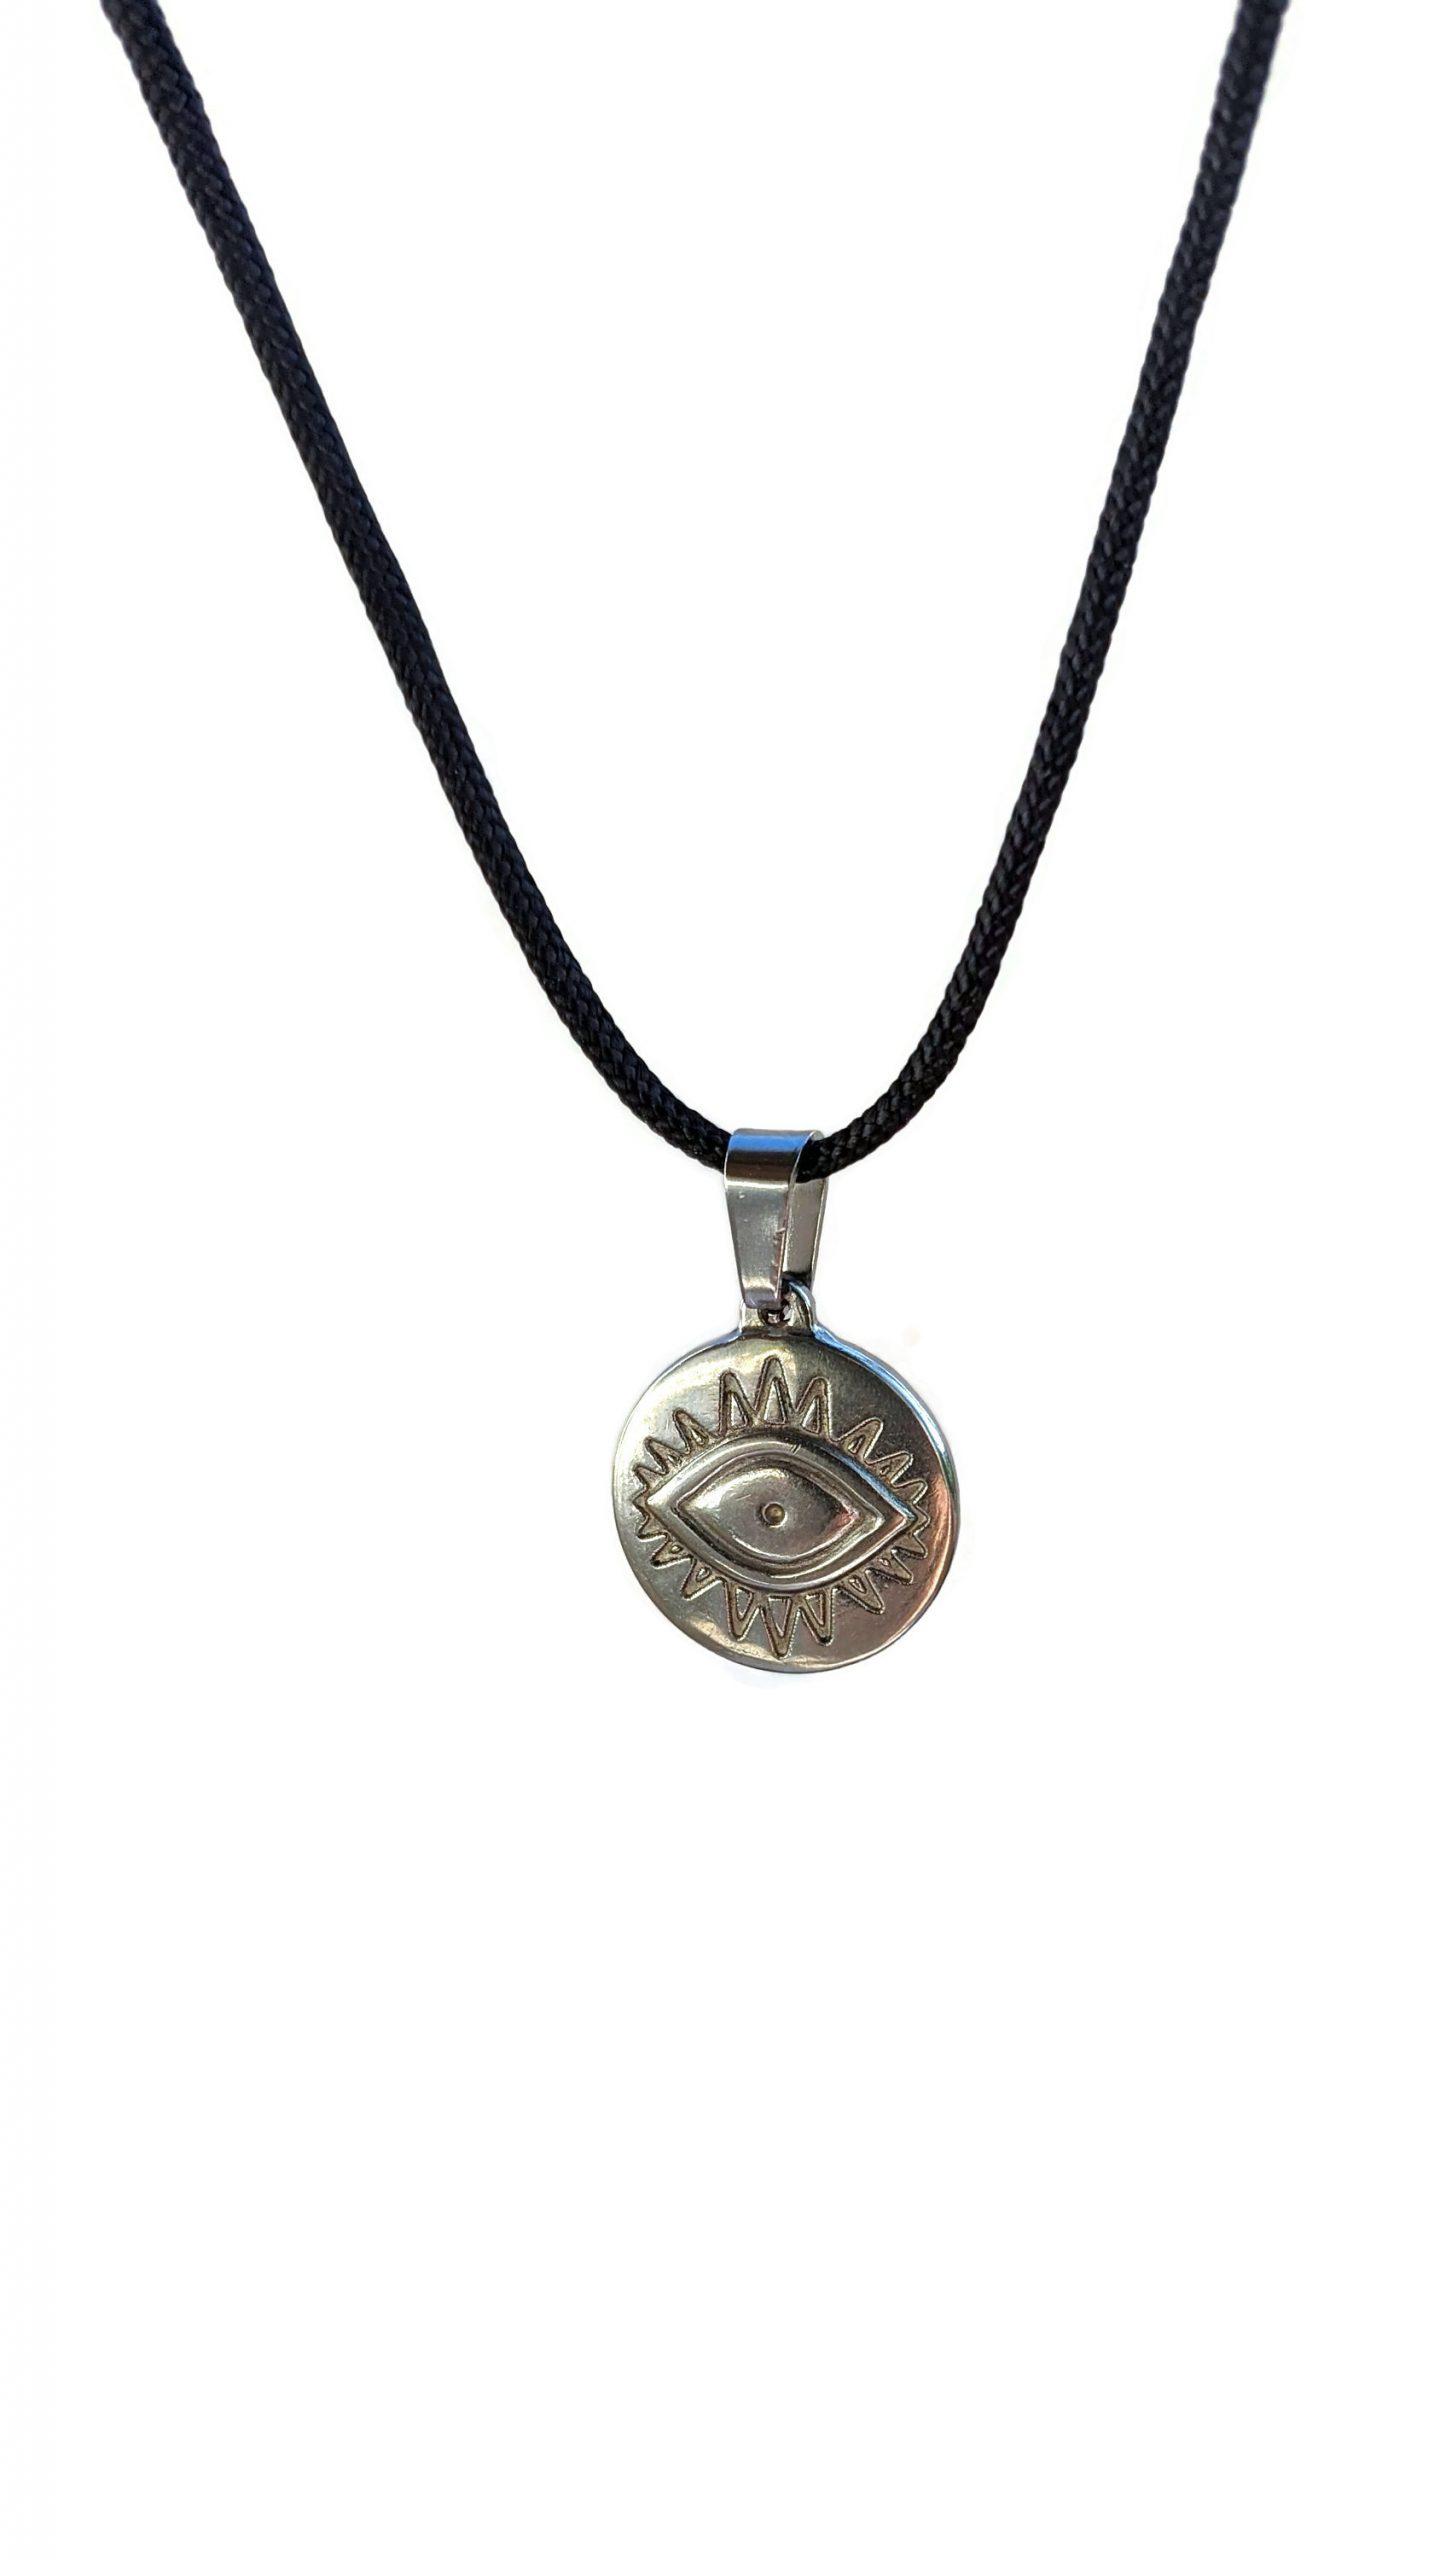 Evil eye stainless necklace for men